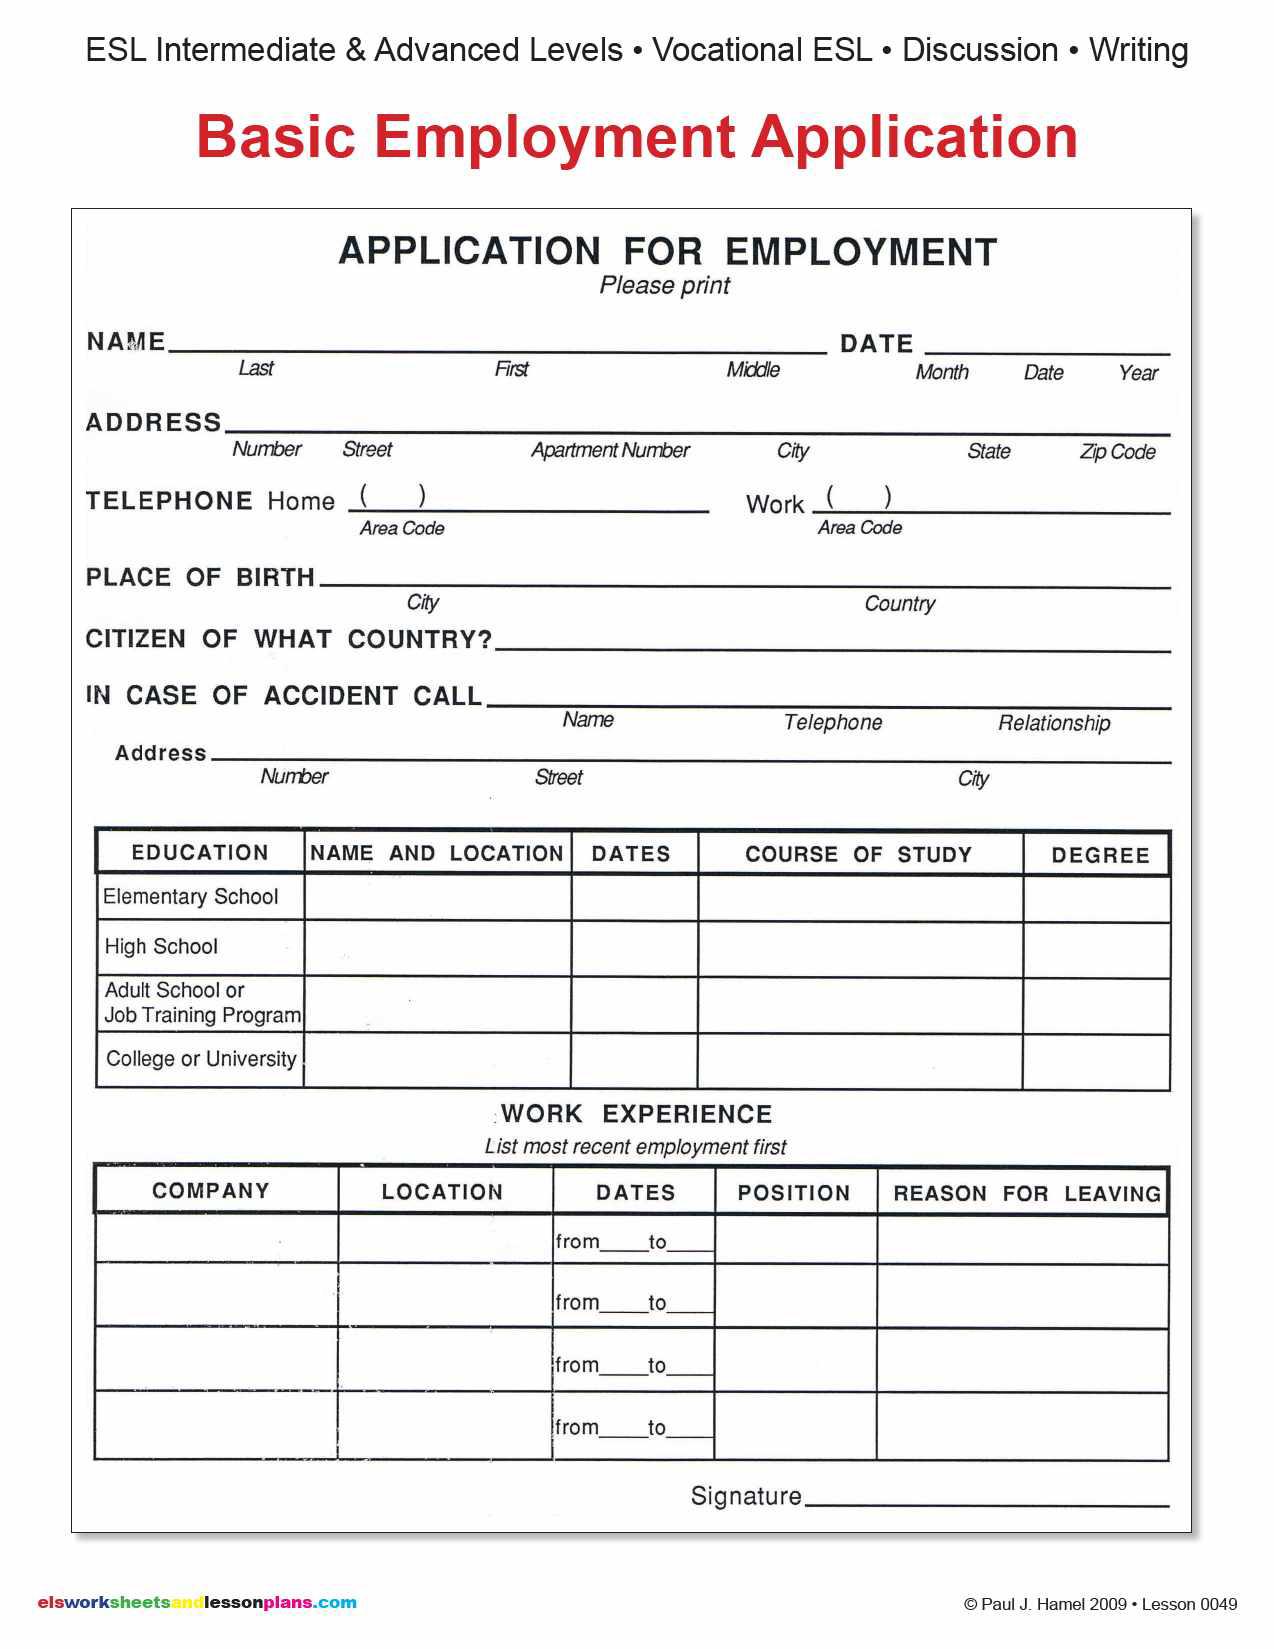 job application forms tk job application forms 23 04 2017